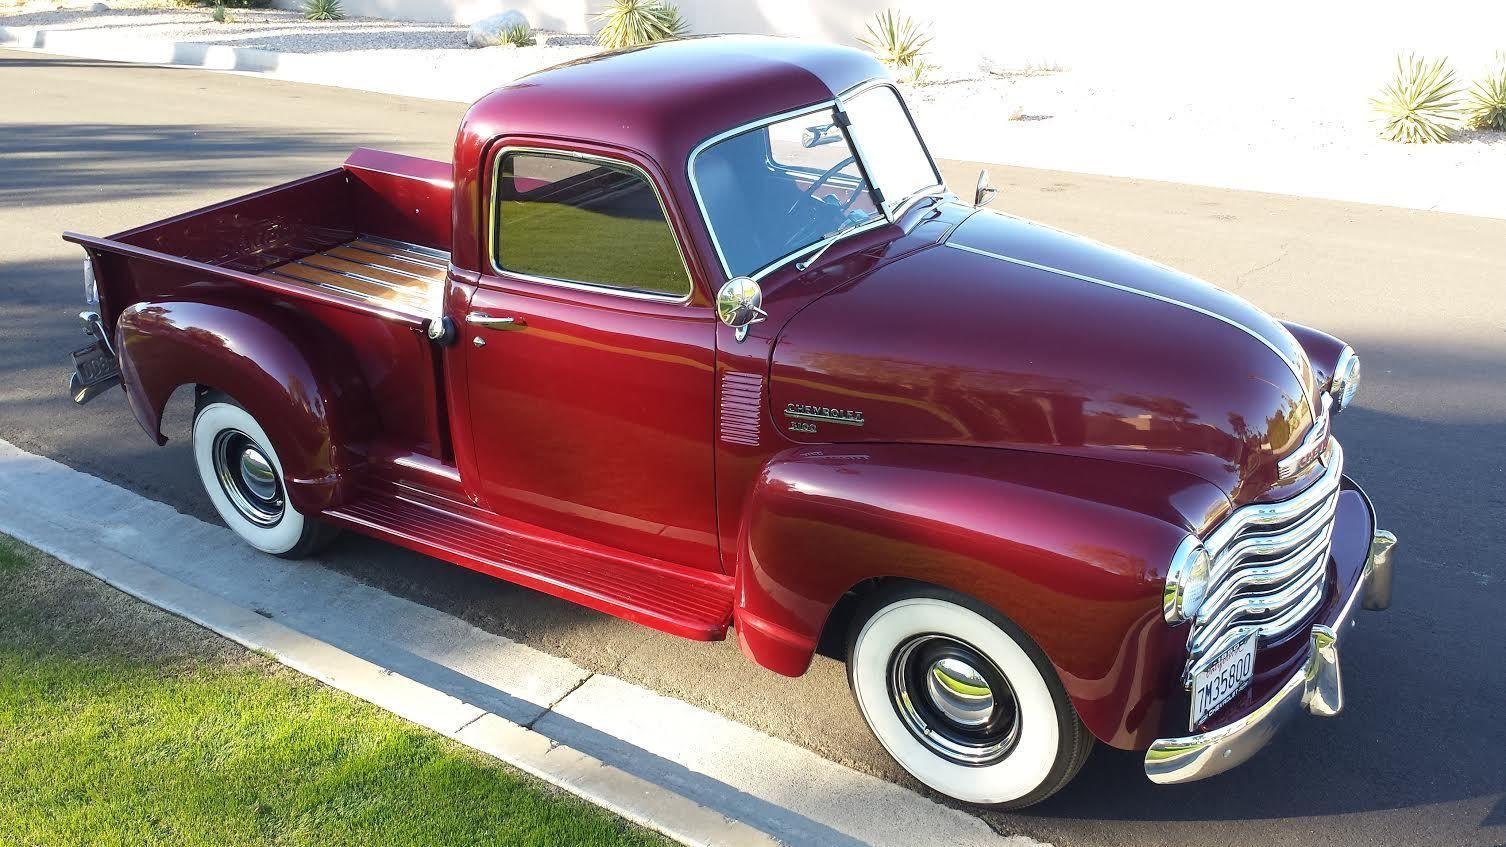 1952 chevy pickup 1951 chev pickup pinterest chevy pickups 1952 chevy pickup publicscrutiny Gallery